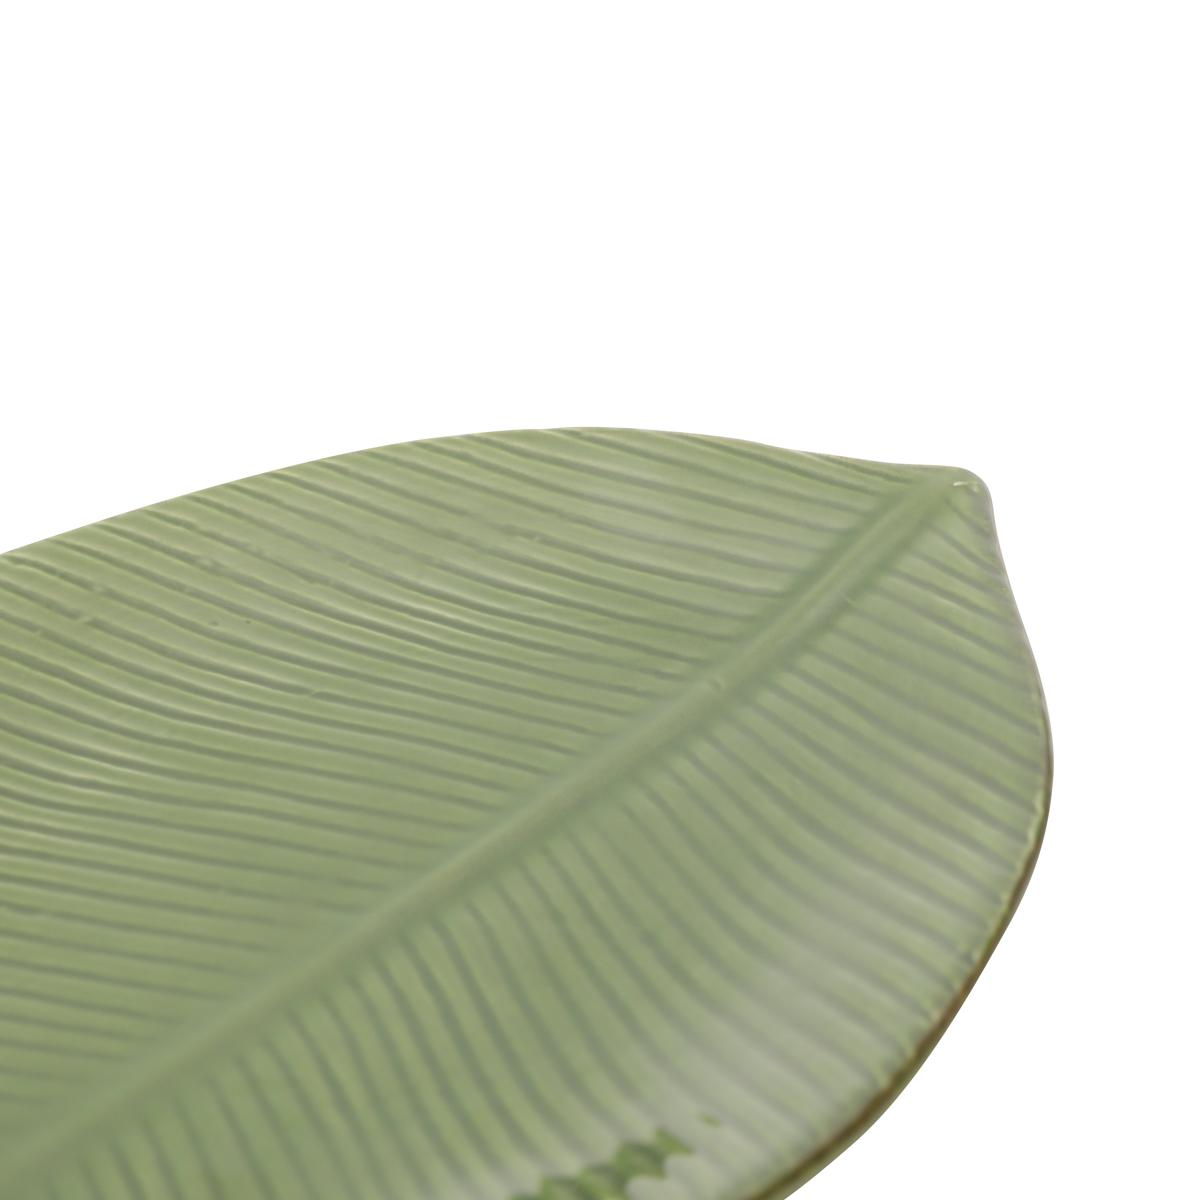 Folha decorativa banana de cerâmica M